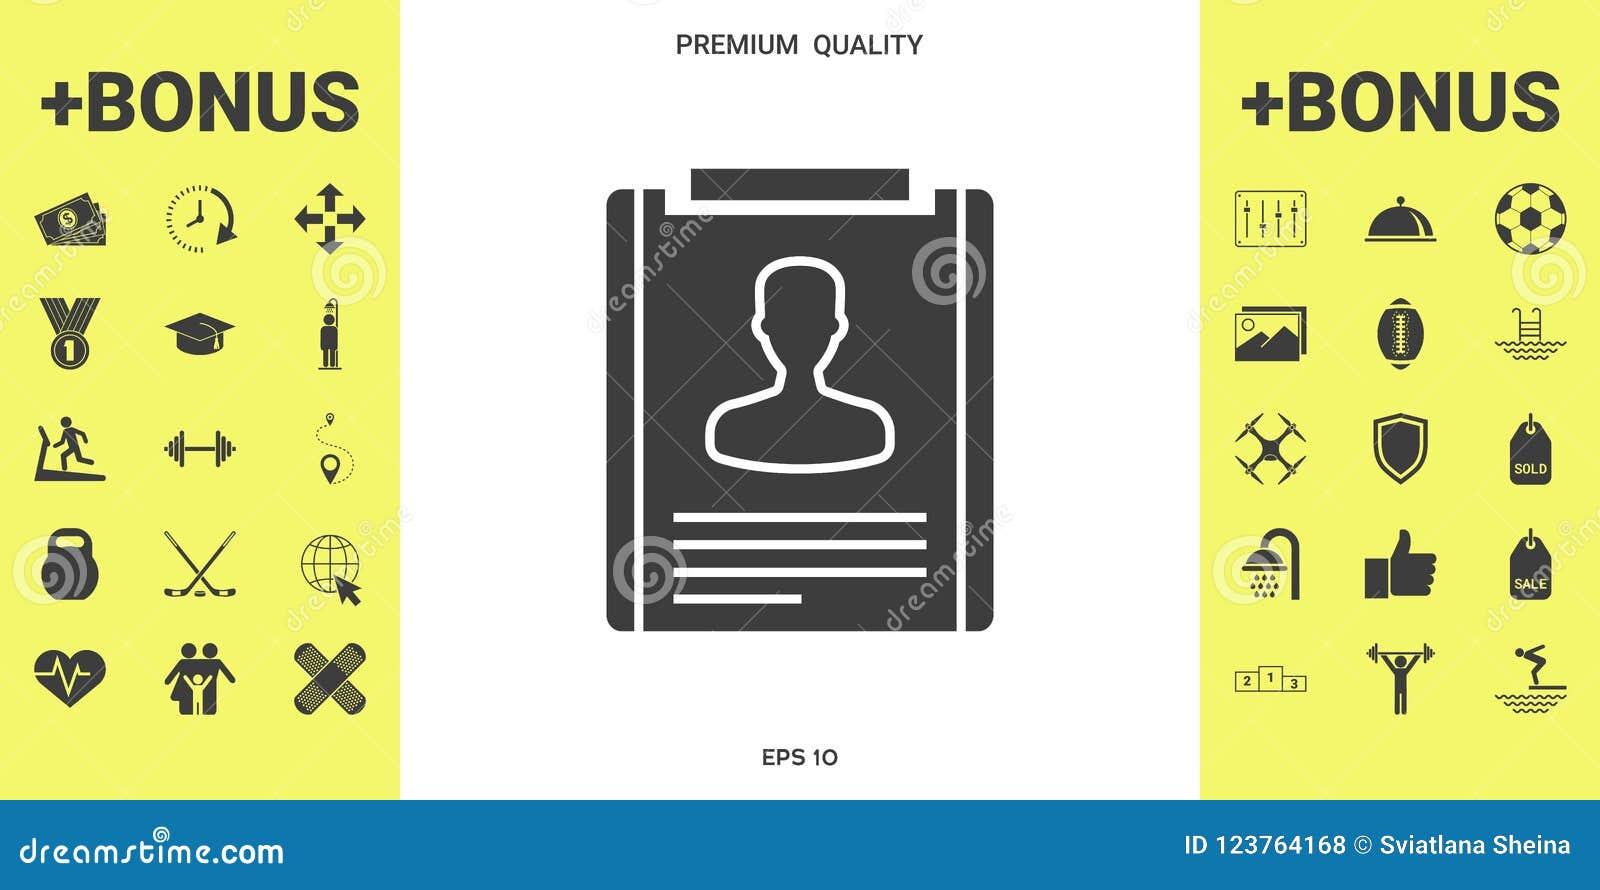 Resume icon symbol stock vector. Illustration of person - 123764168